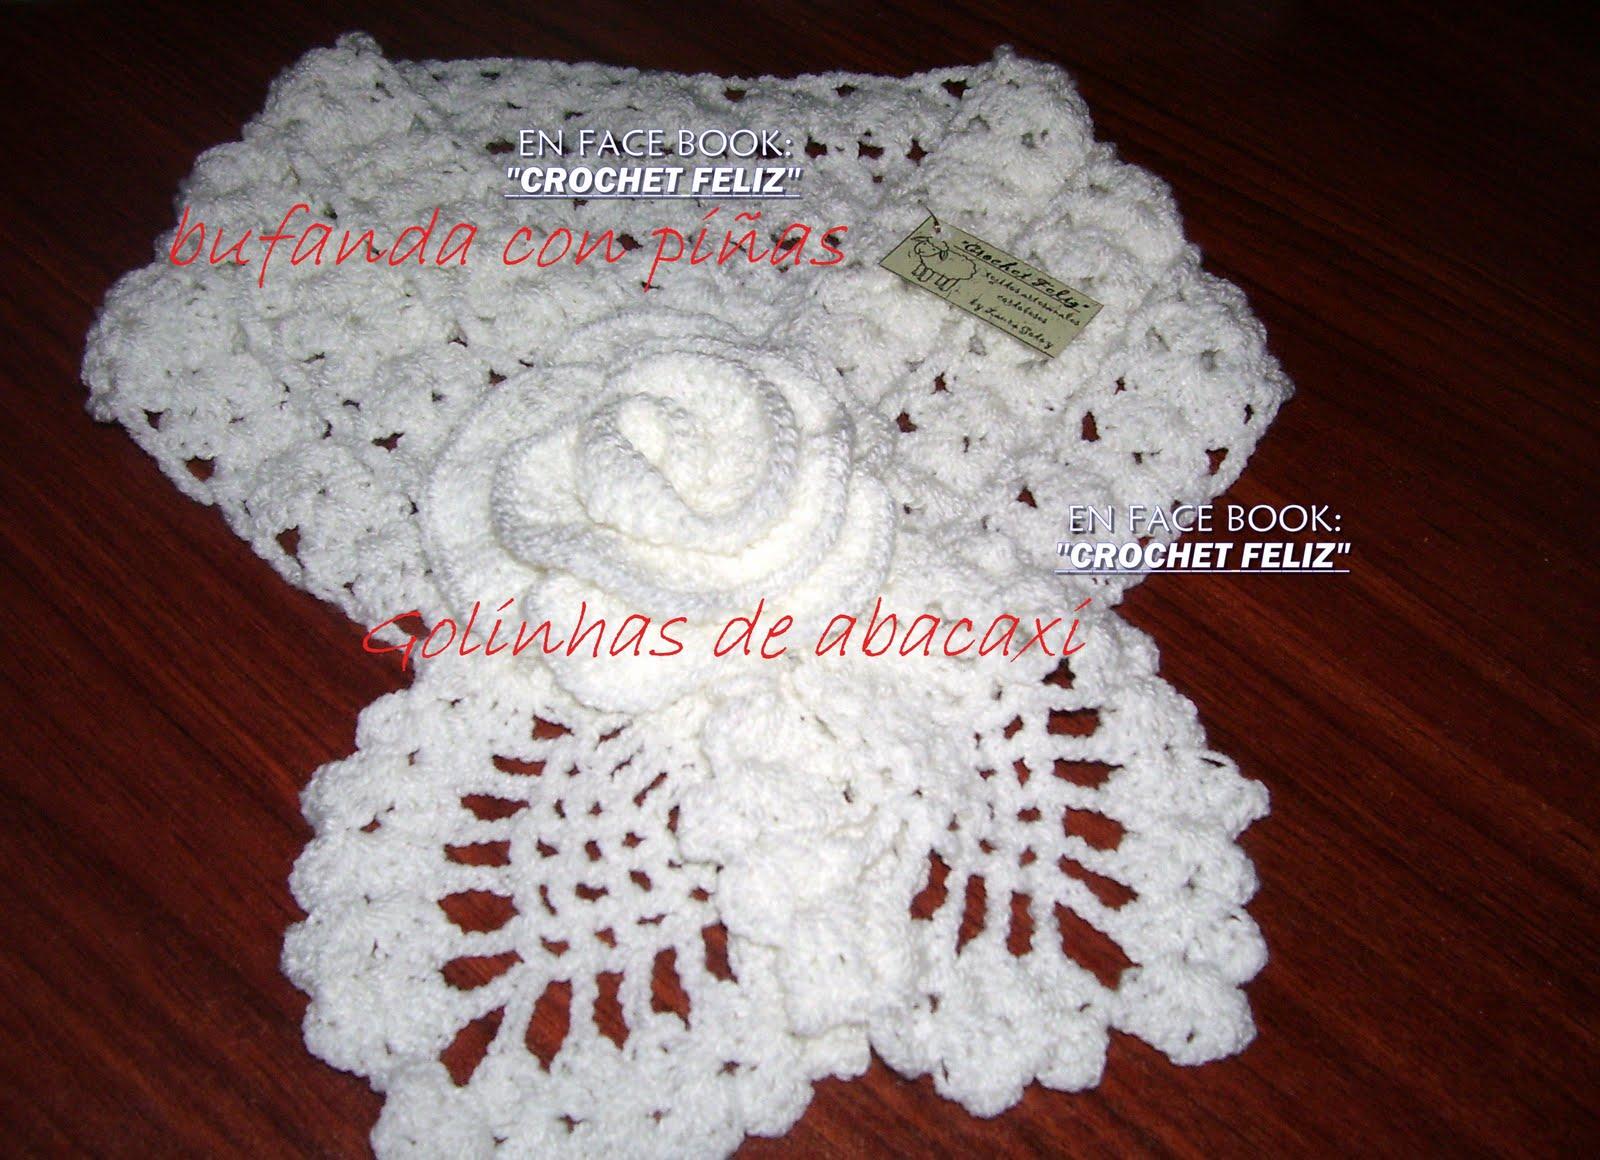 crochet , pintura: Bufanda con piñas